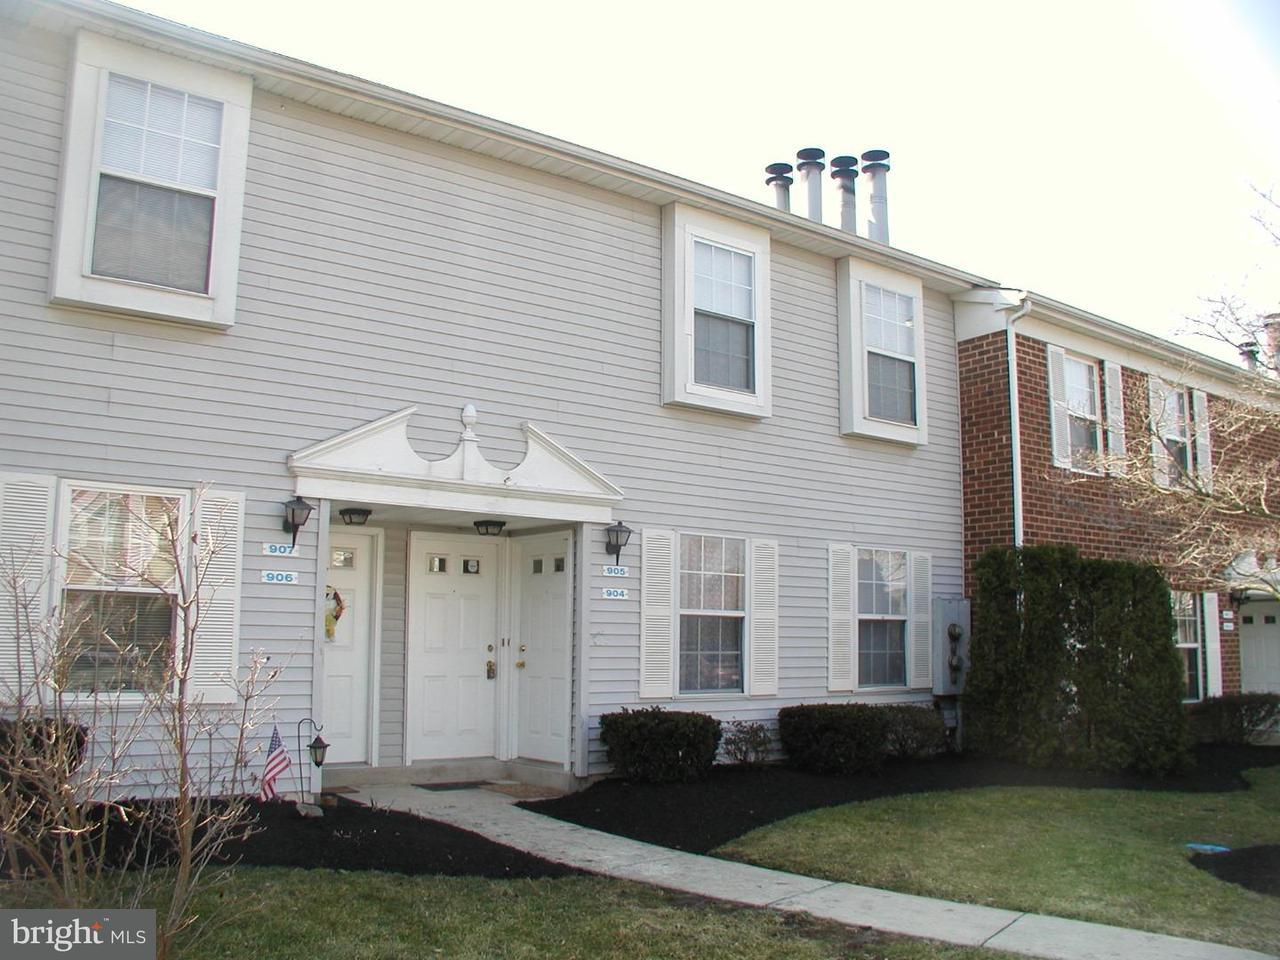 独户住宅 为 出租 在 905 HUNTINGDON MEWS Clementon, 新泽西州 08021 美国